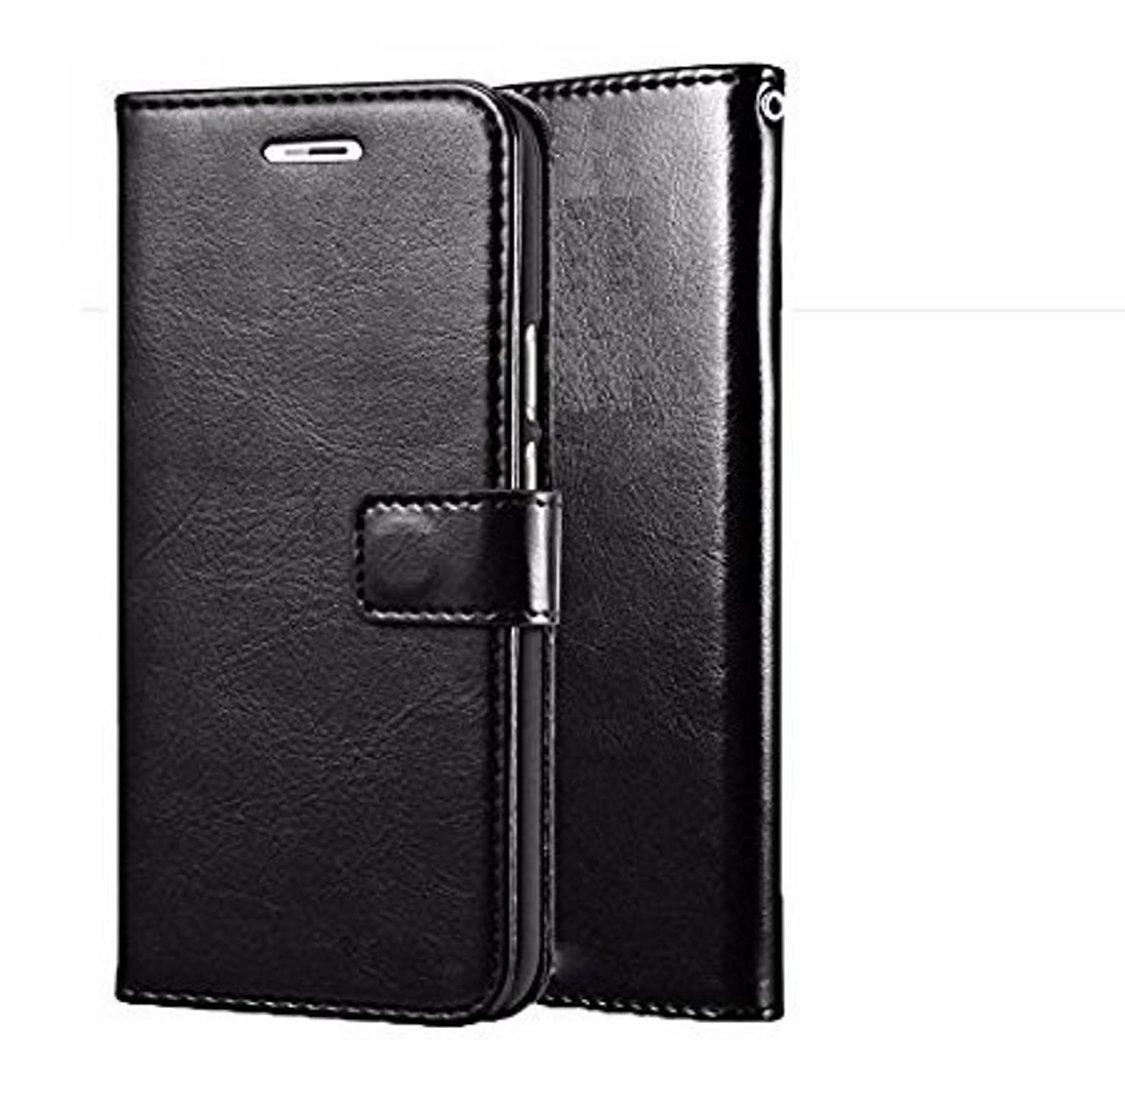 D G Kases Vintage Pu Leather Kickstand Wallet Flip Case Cover For Samsung Galaxy On5   Black